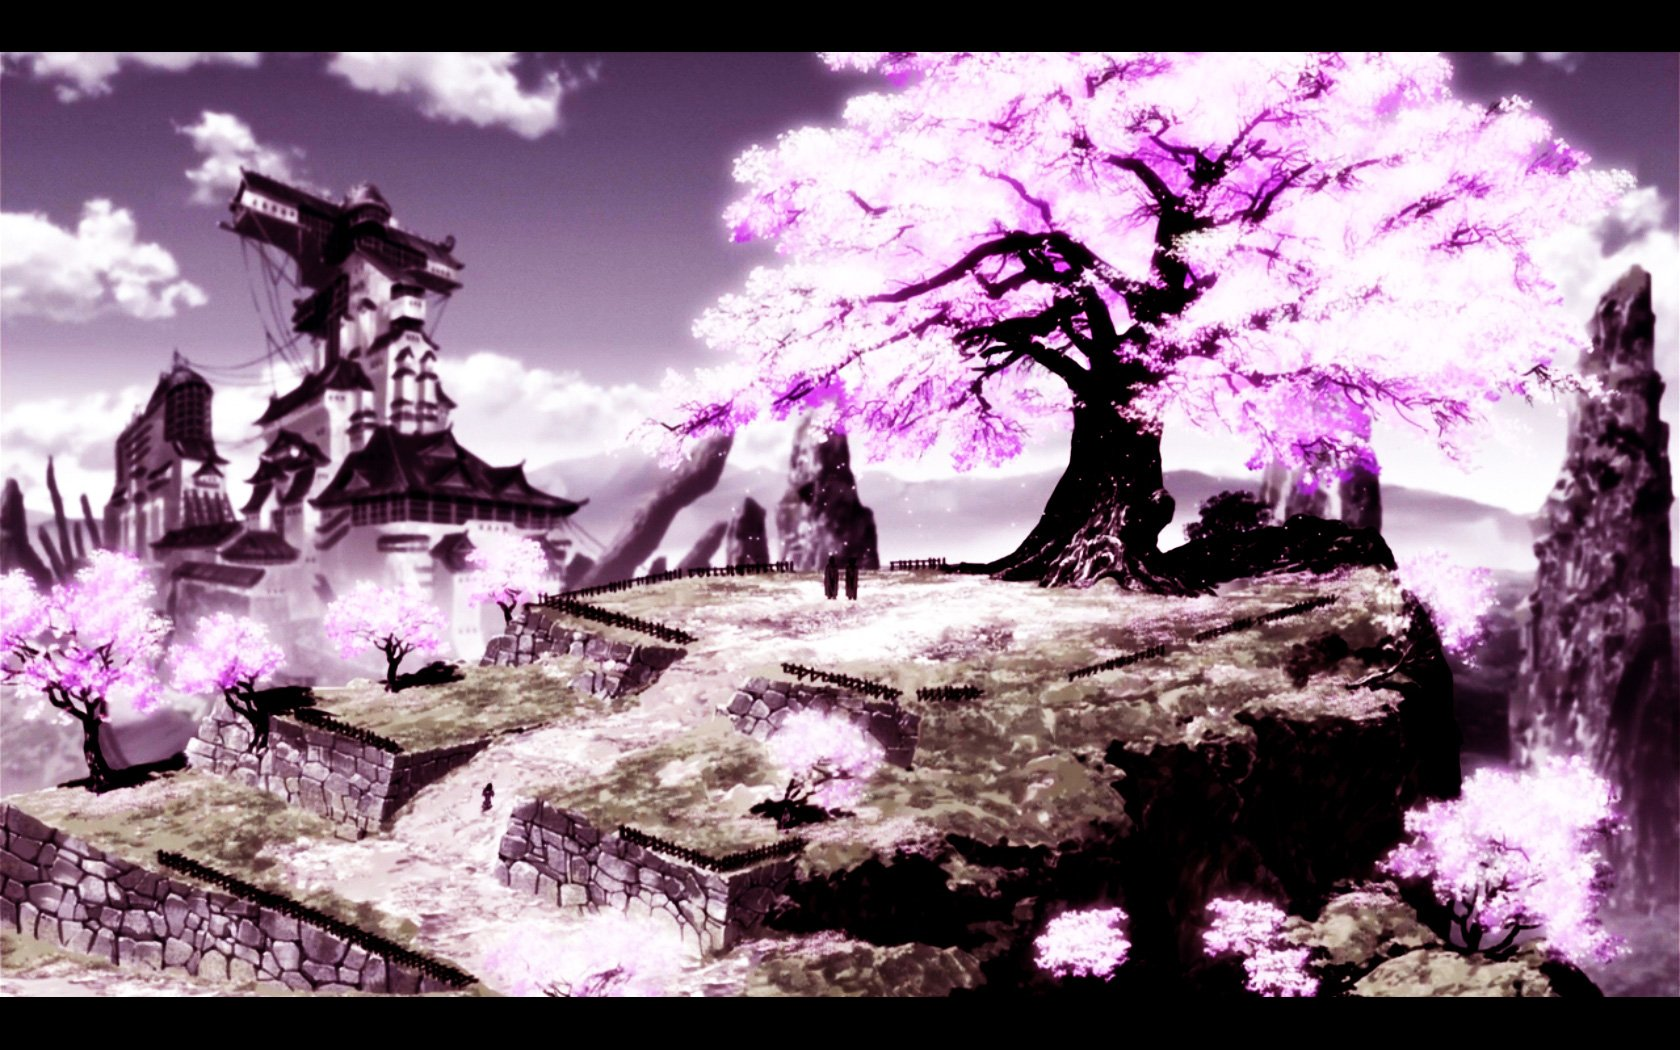 Anime Anime Scenery Cherry Tree Anime Scenerie Kawaii Anime 1680x1050